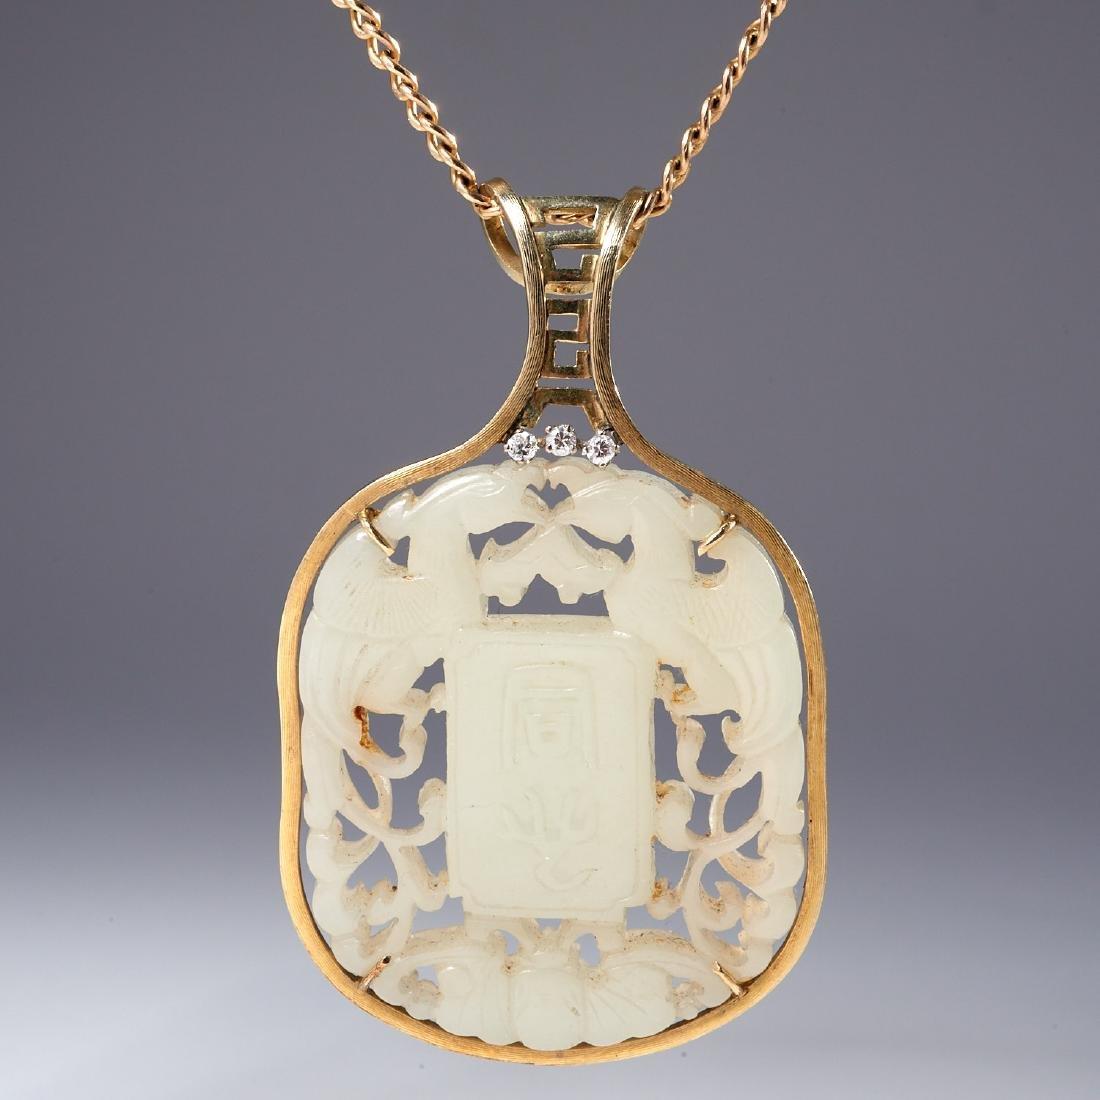 Chinese white jade pendant necklace